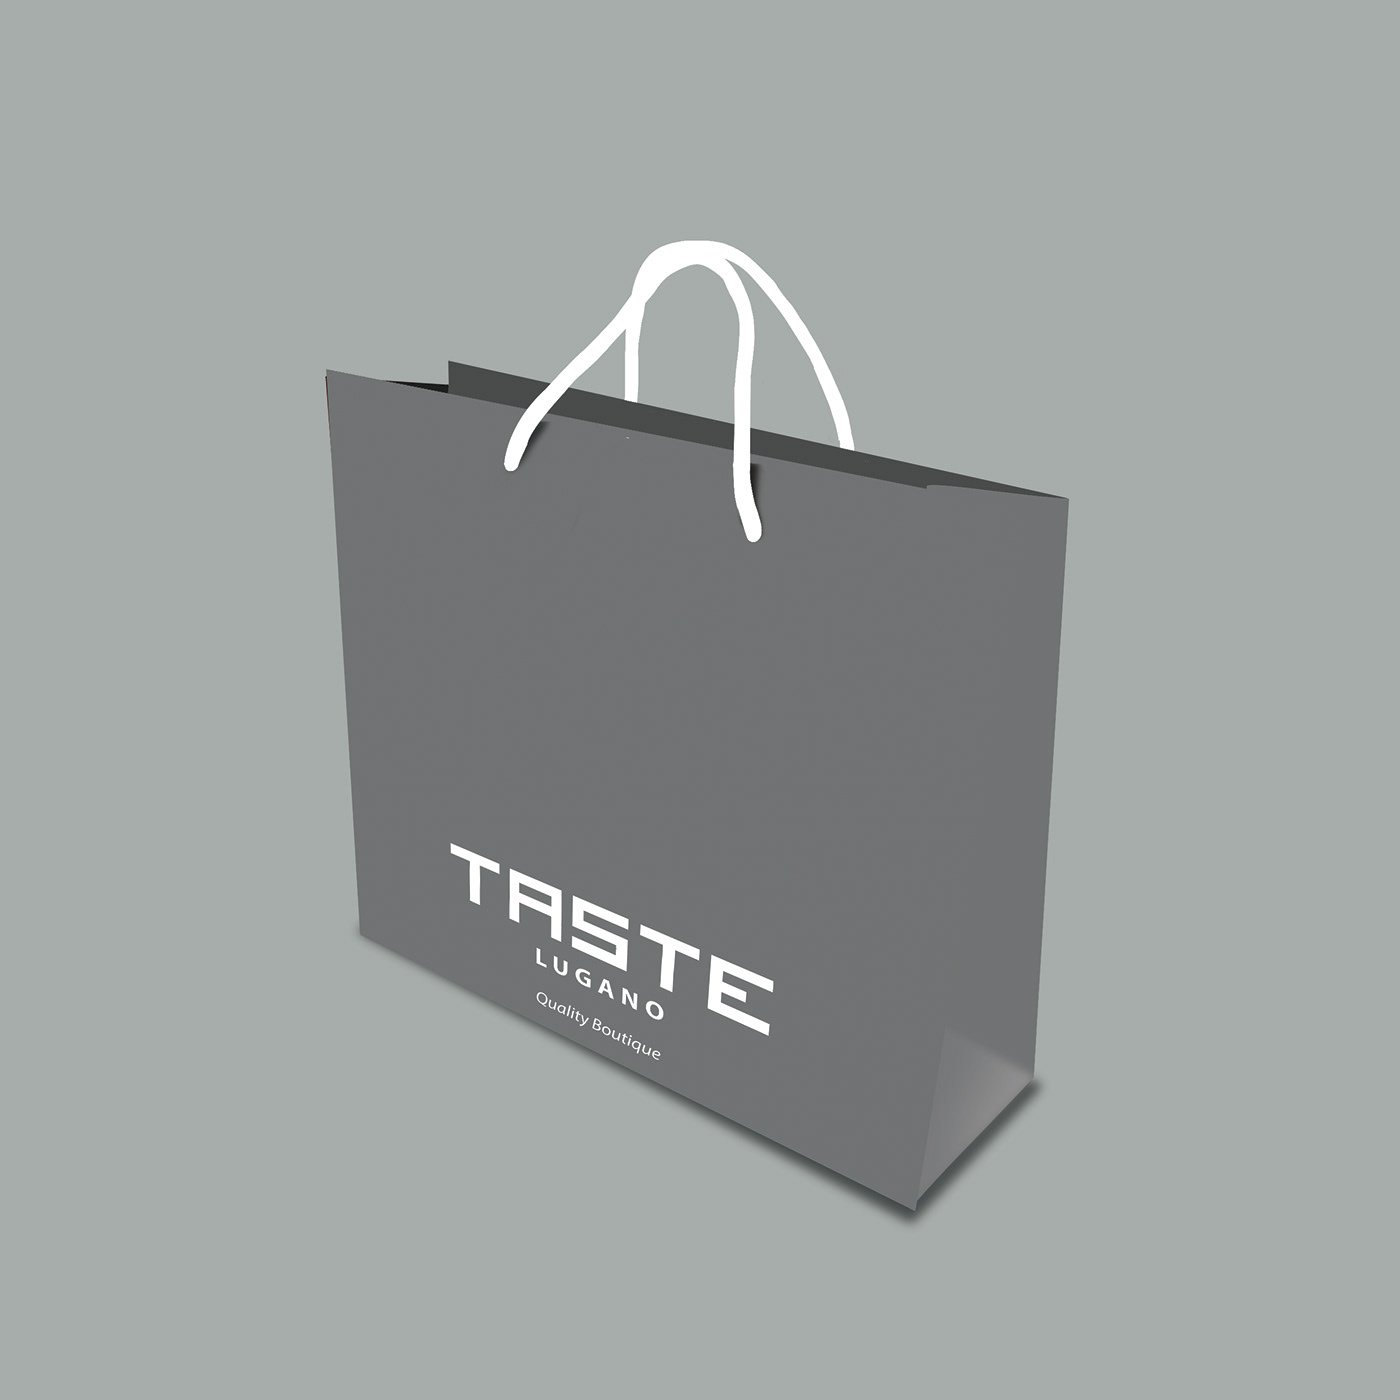 Shopper shopping bags graphic Packaging buste bags press CMYK pantone